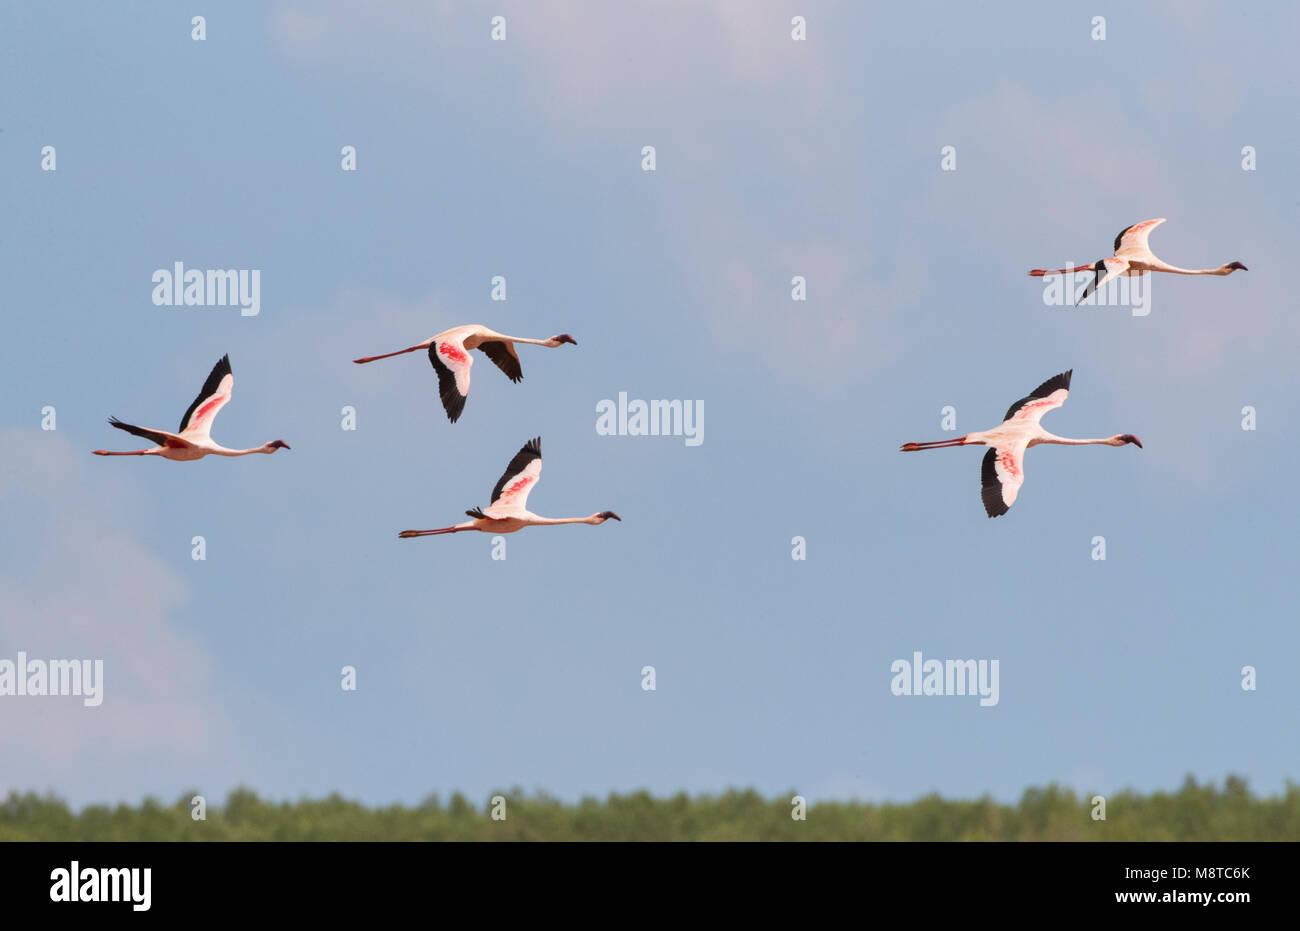 Kleine Flamingo in Vlucht; Lesser Flamingo's (Phoeniconaias minor) im Flug Stockbild